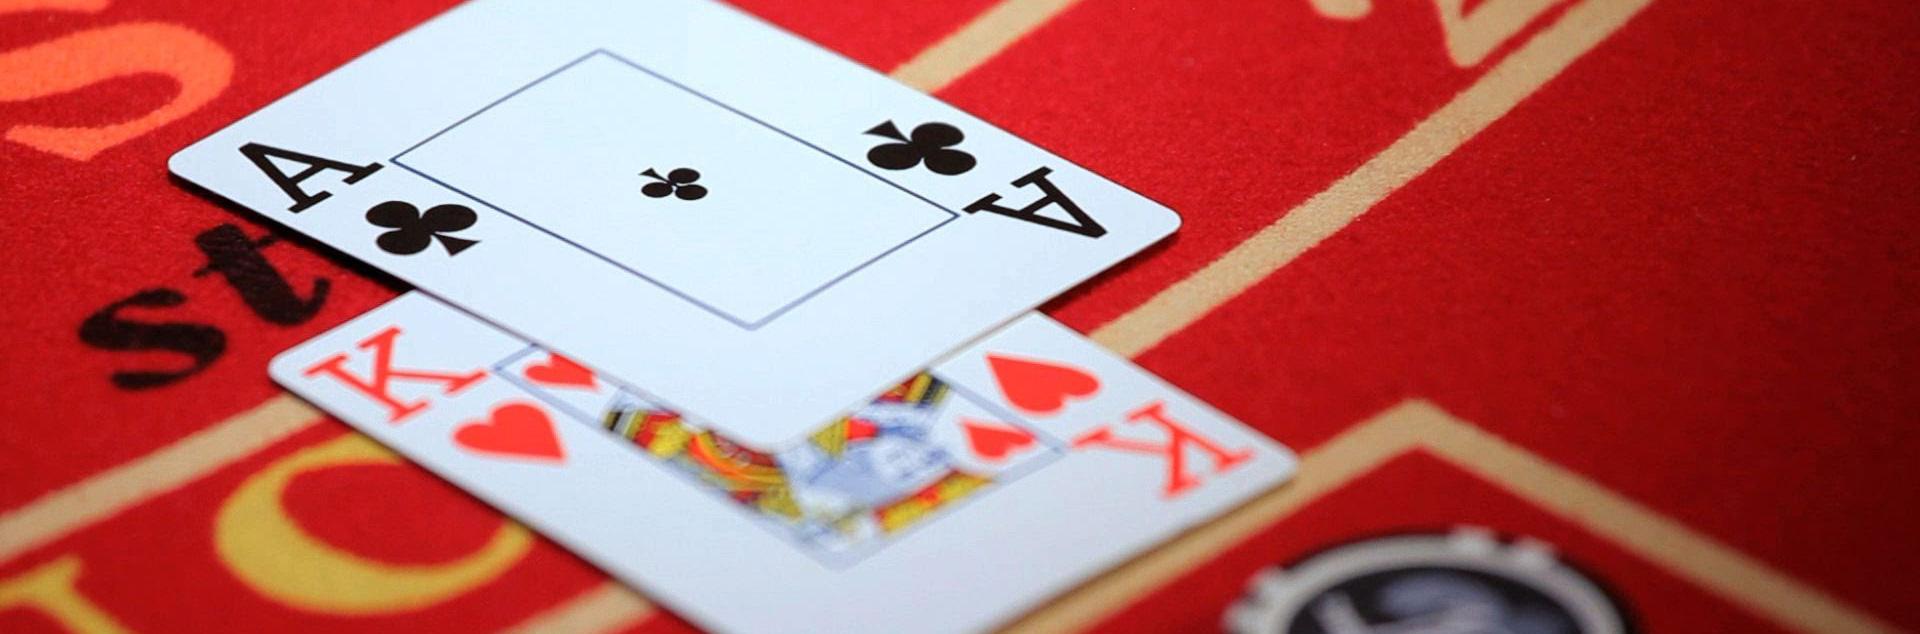 casinos online gratis sin descargar